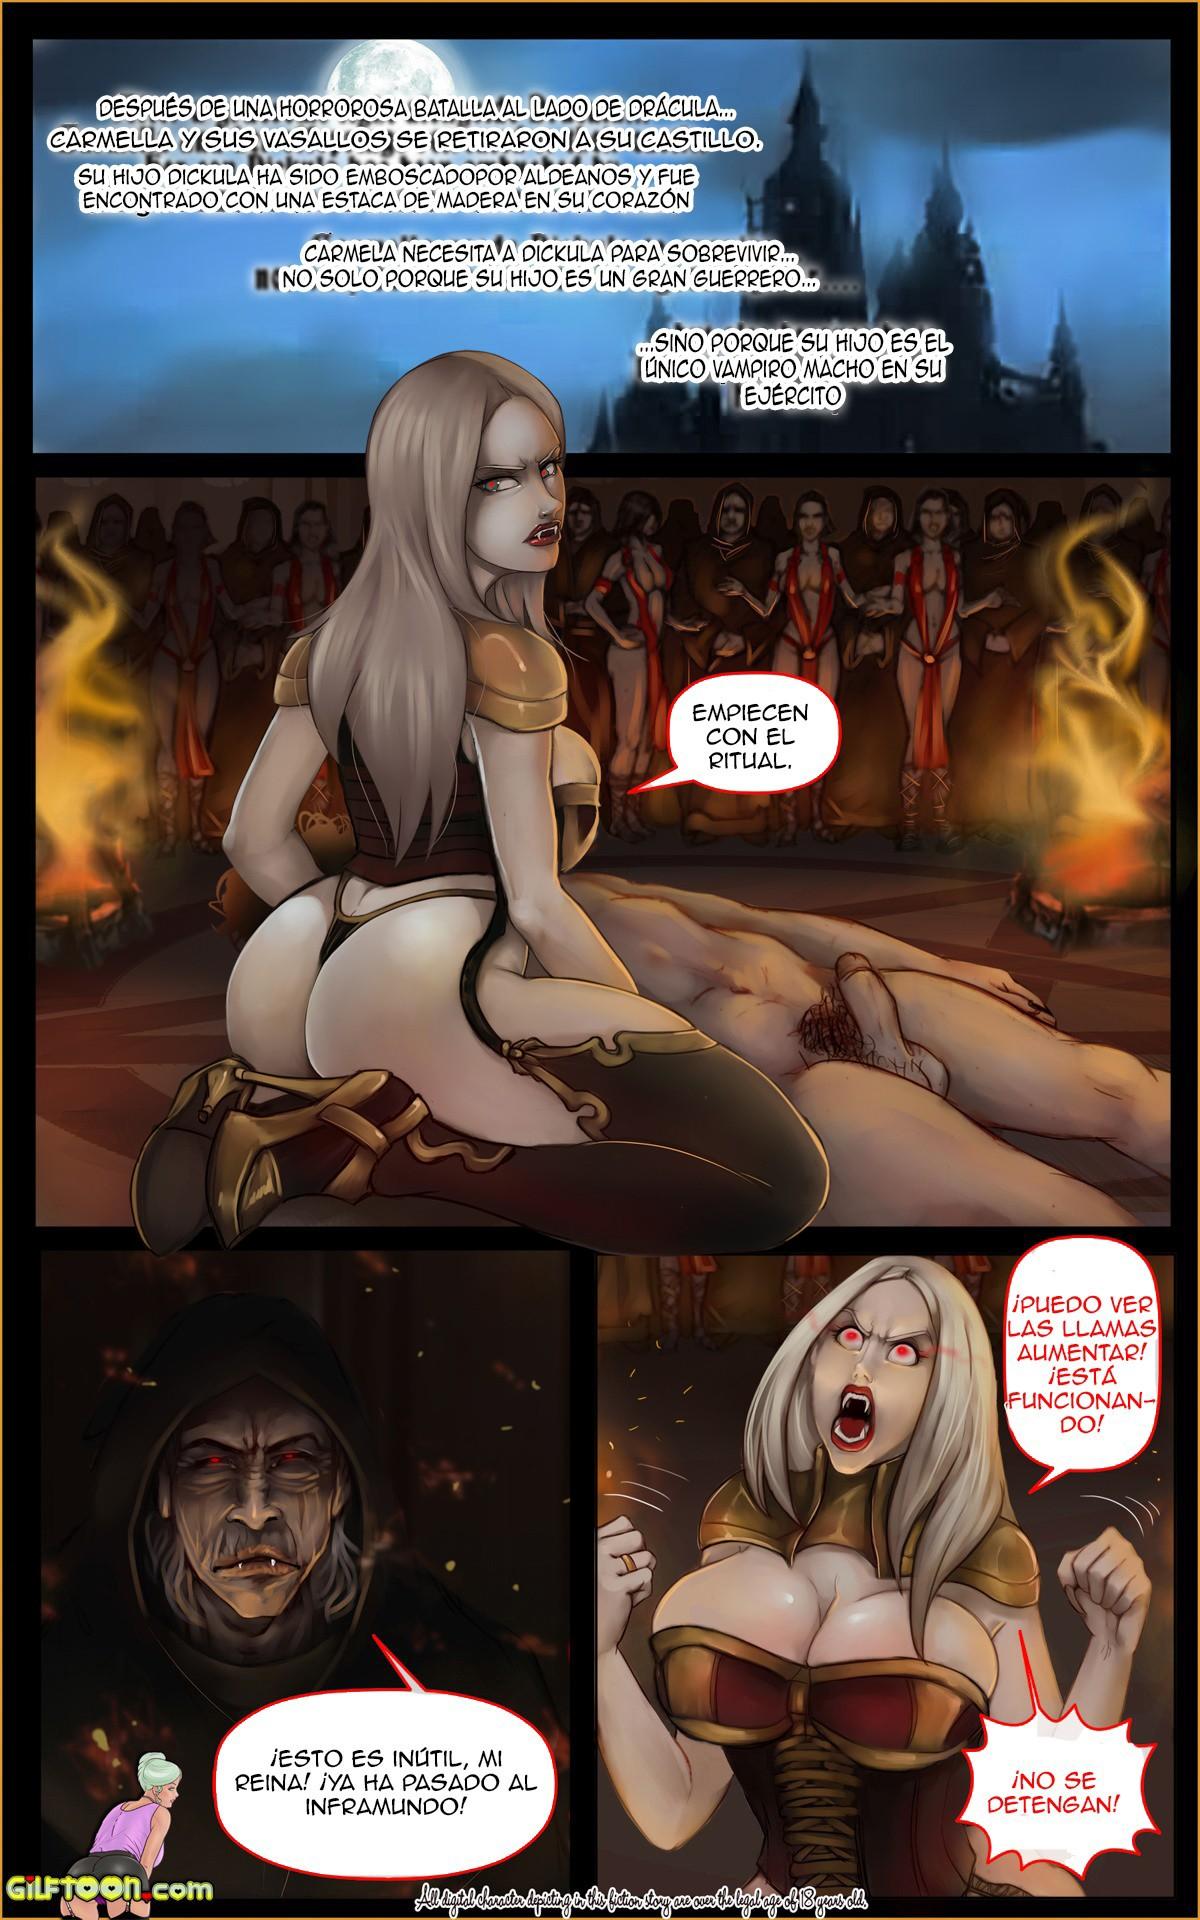 Vampires-Grandson-Gilftoon-02.jpg comic porno